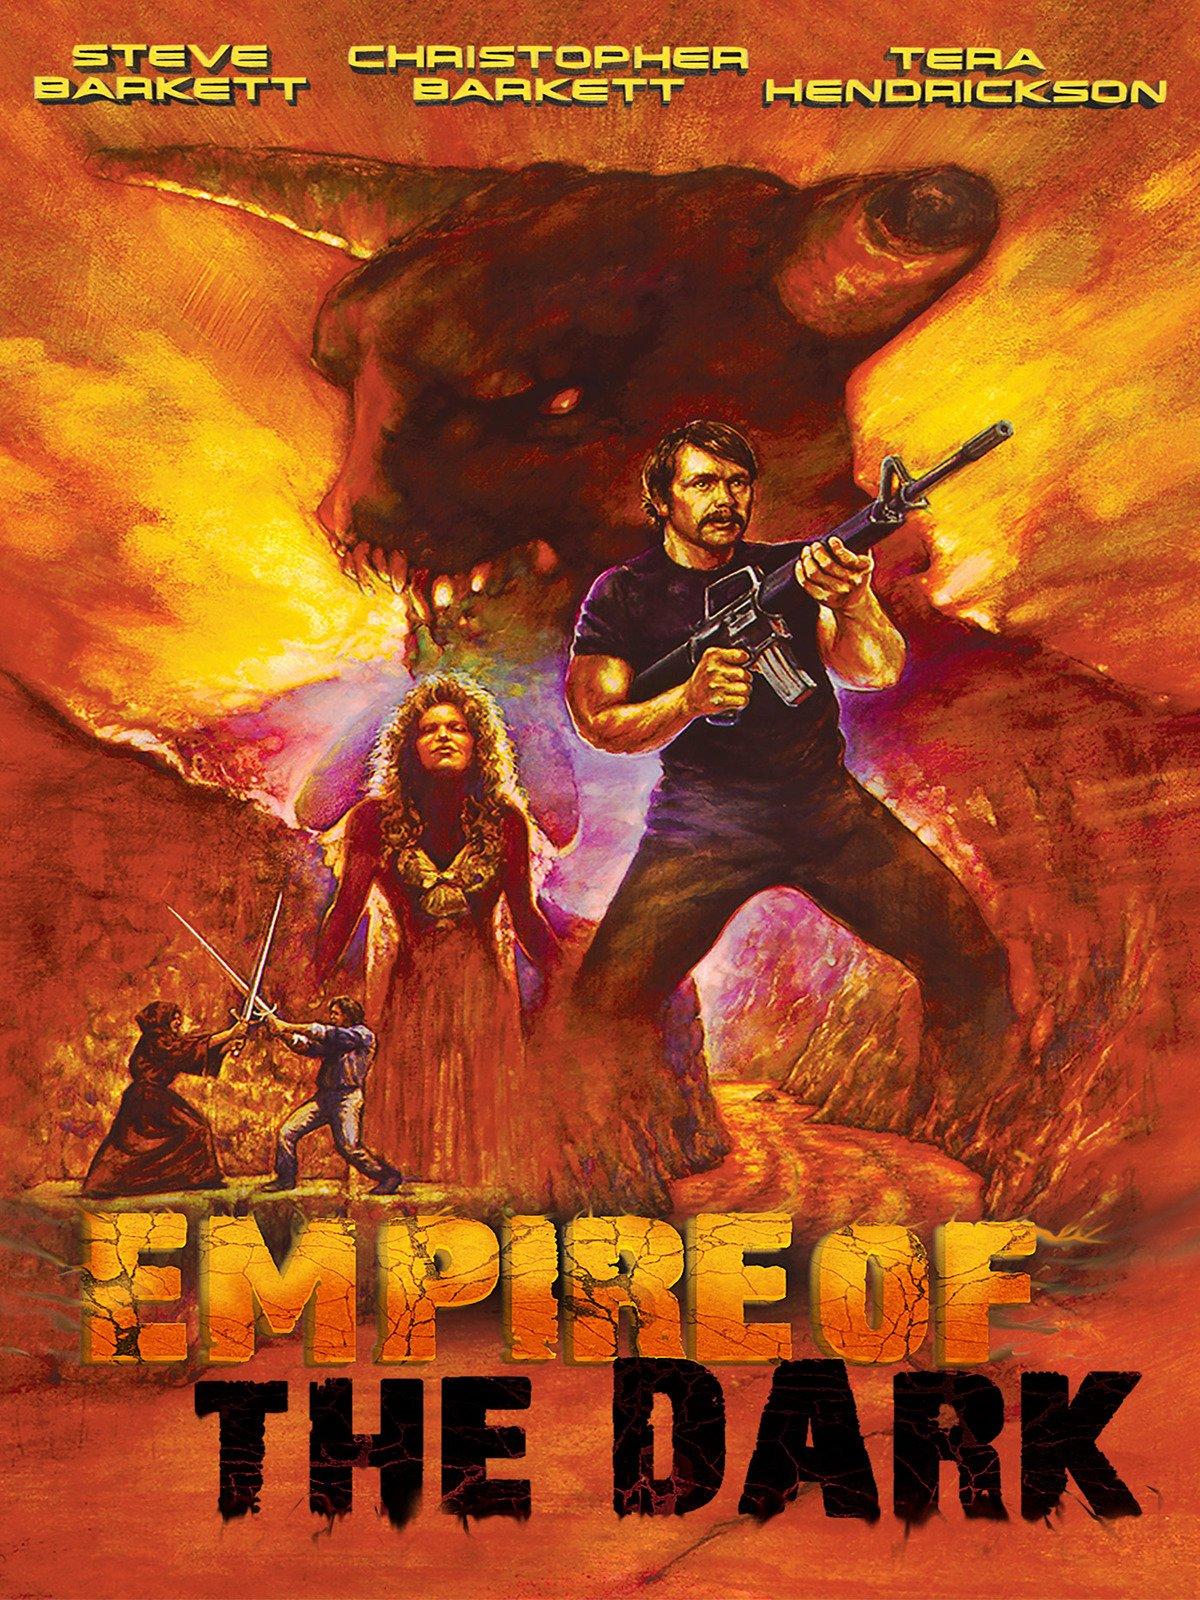 Amazon.com: Empire of the Dark: Steve Barkett